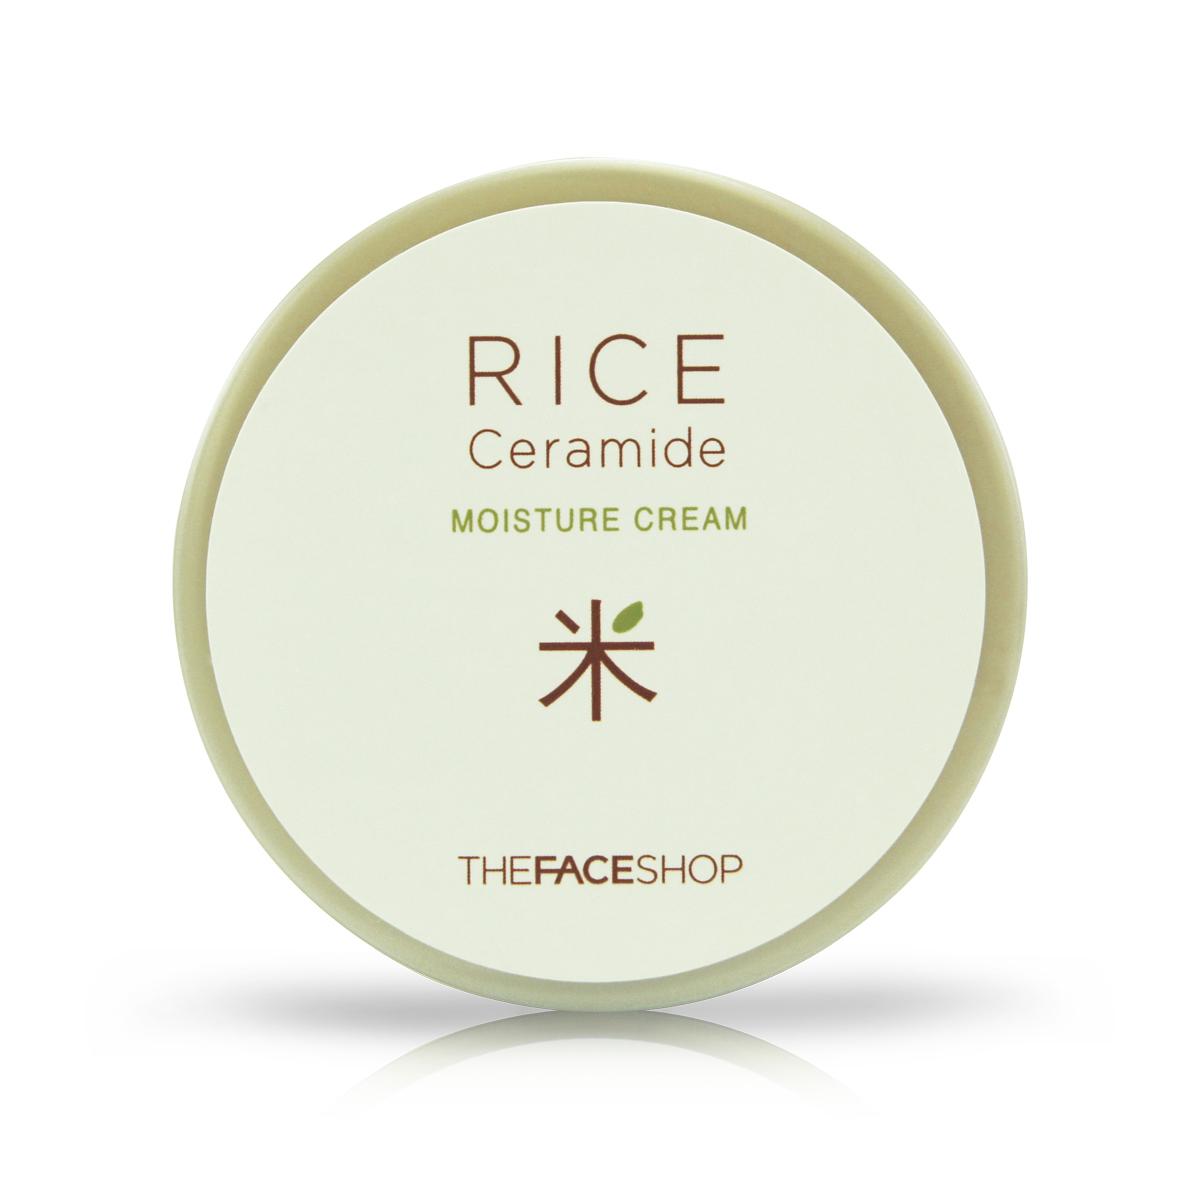 The Face Shop 菲詩小鋪 大米調理保濕霜